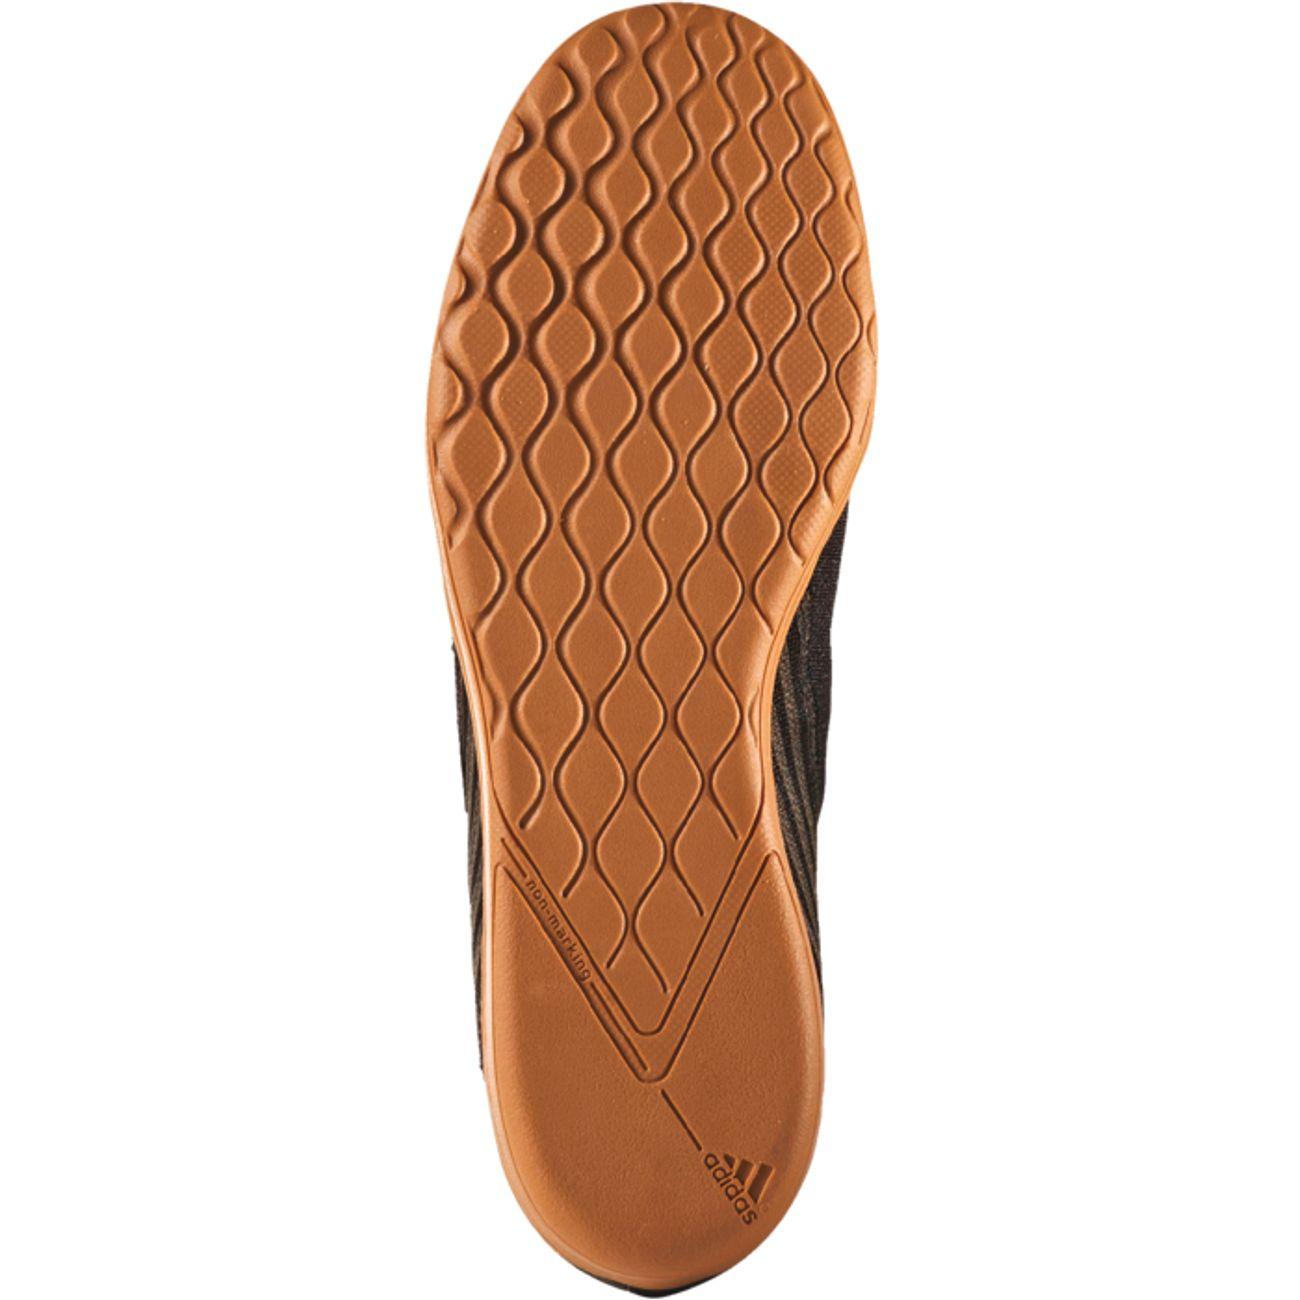 CHAUSSURE FOOT  adulte ADIDAS NEMEZIZ 17.4 IC SALA AH.17